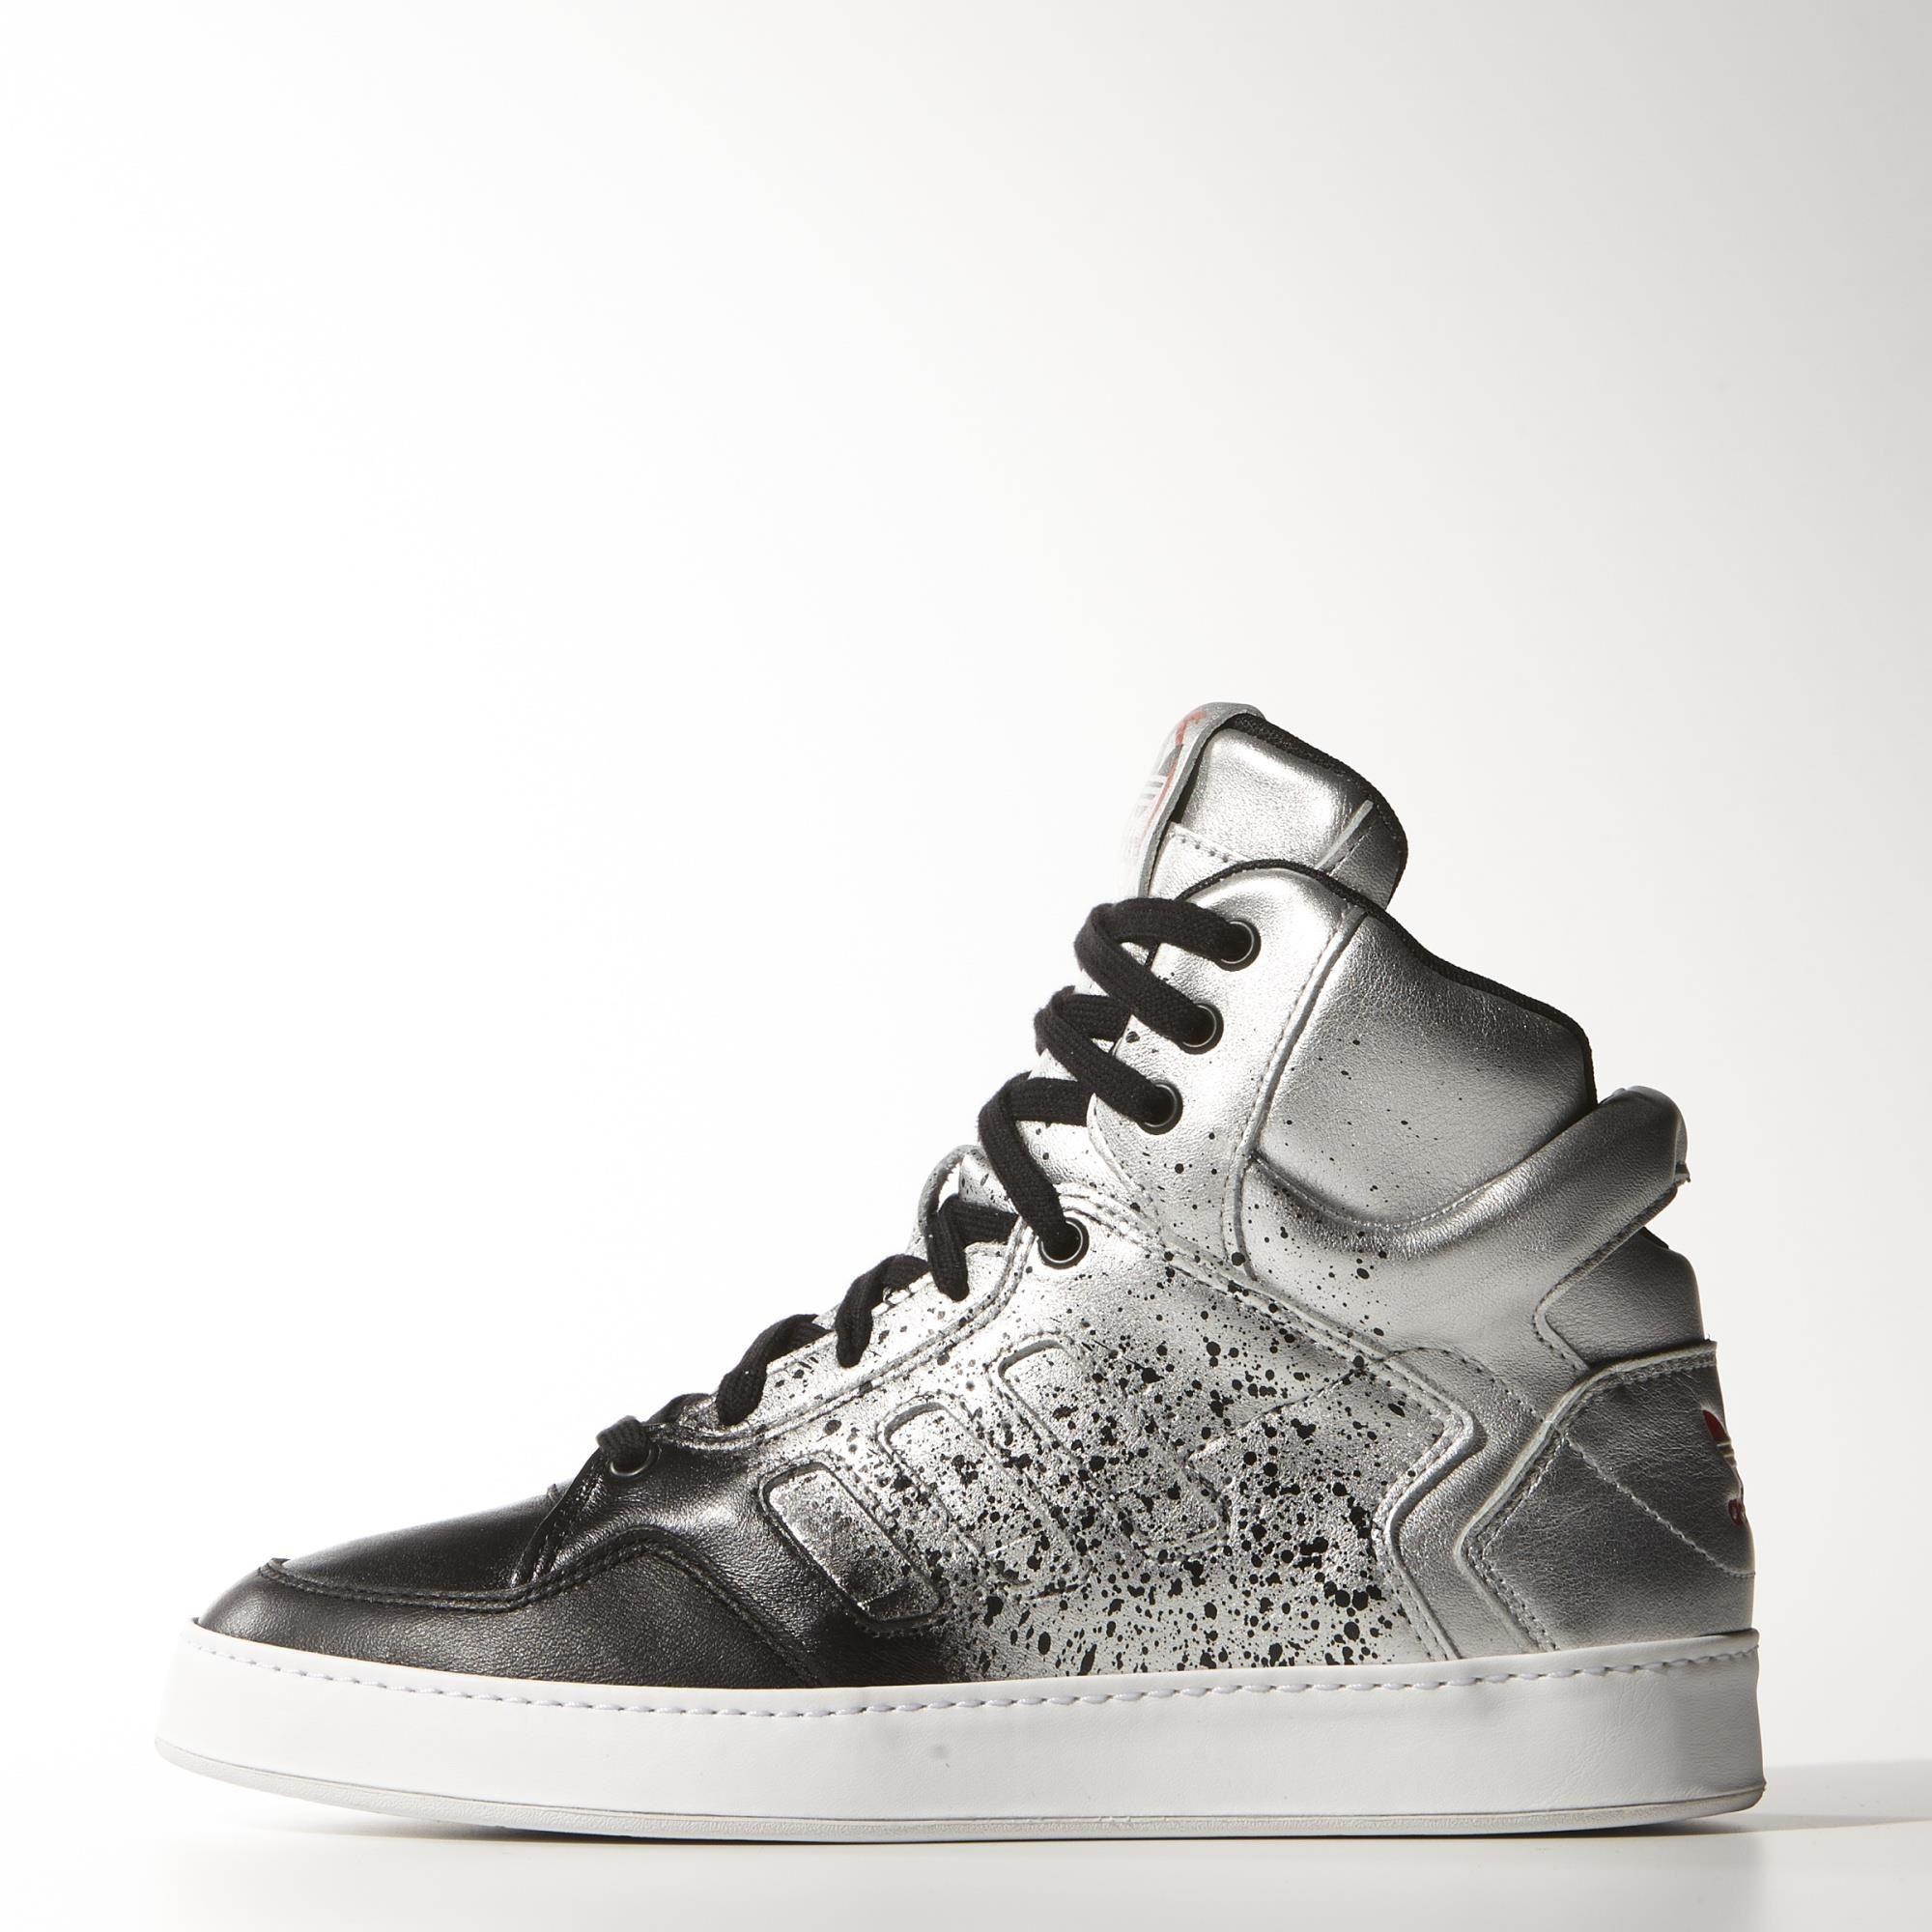 e0642f531c5 adidas - Bankshot Rita Ora 2.0 Shoes